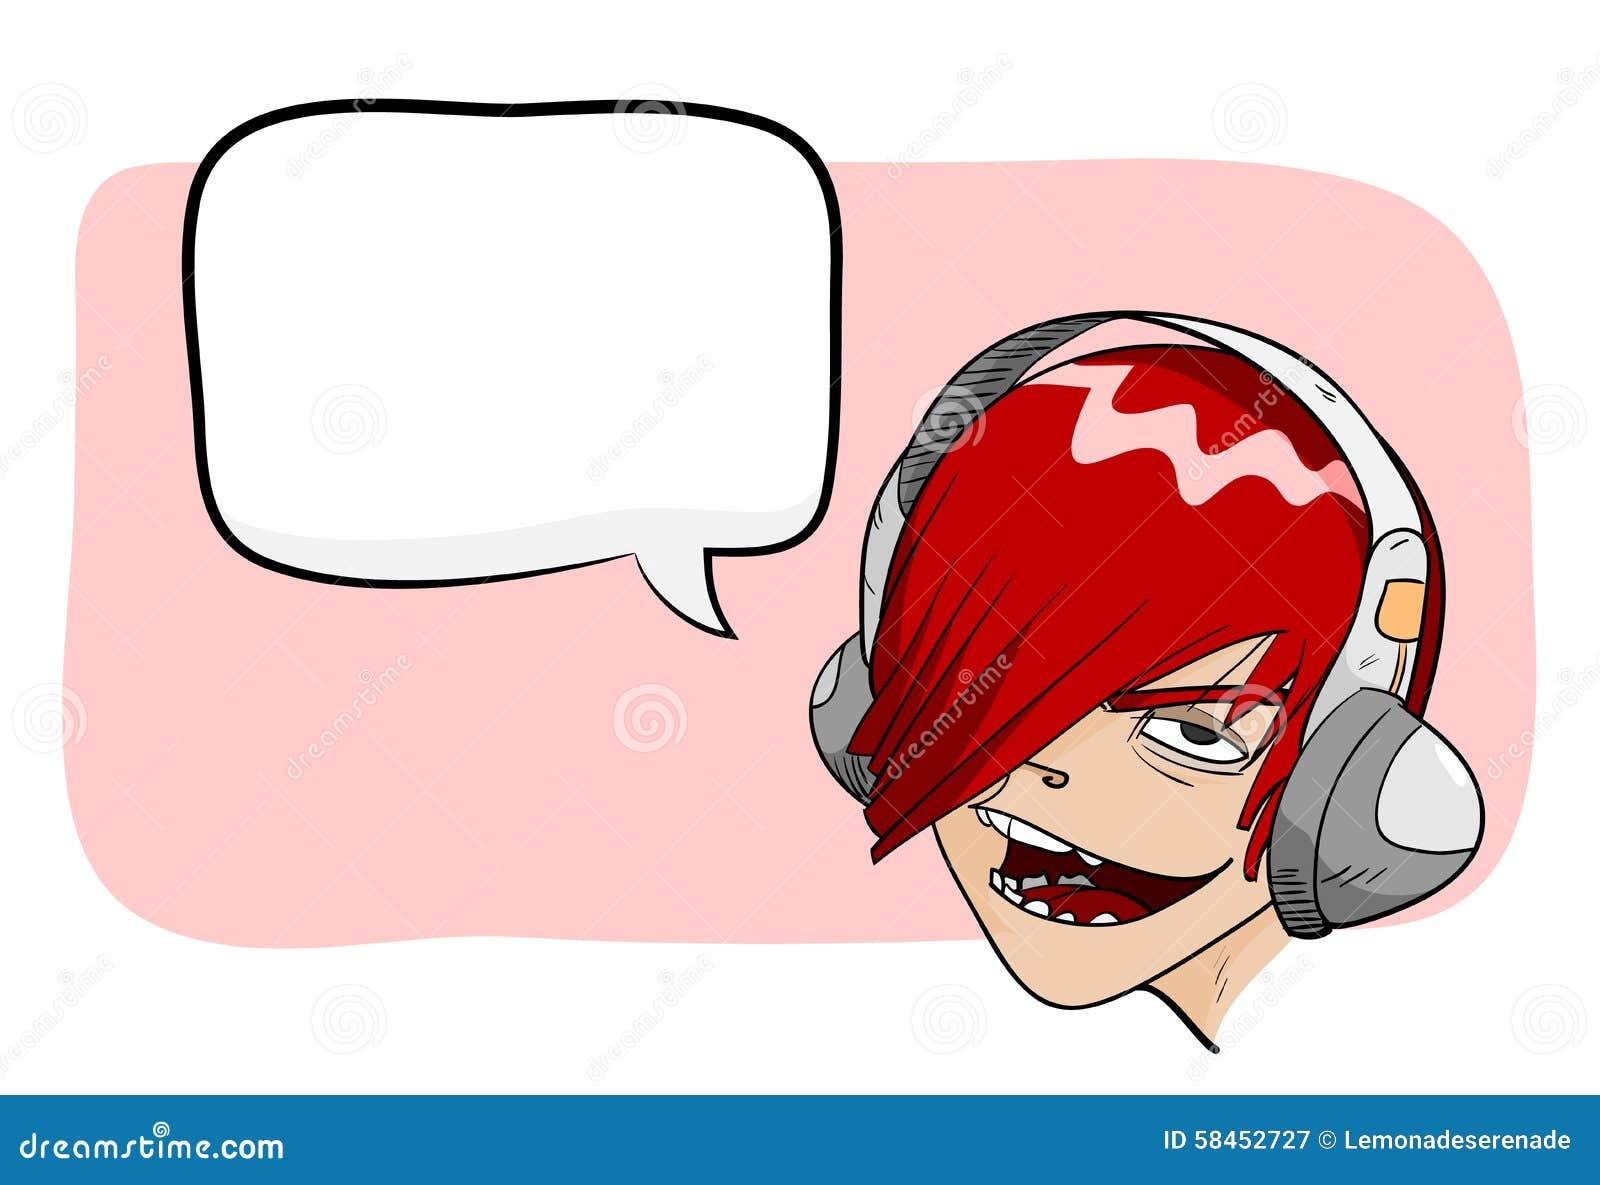 Audiophile Cartoons Illustrations